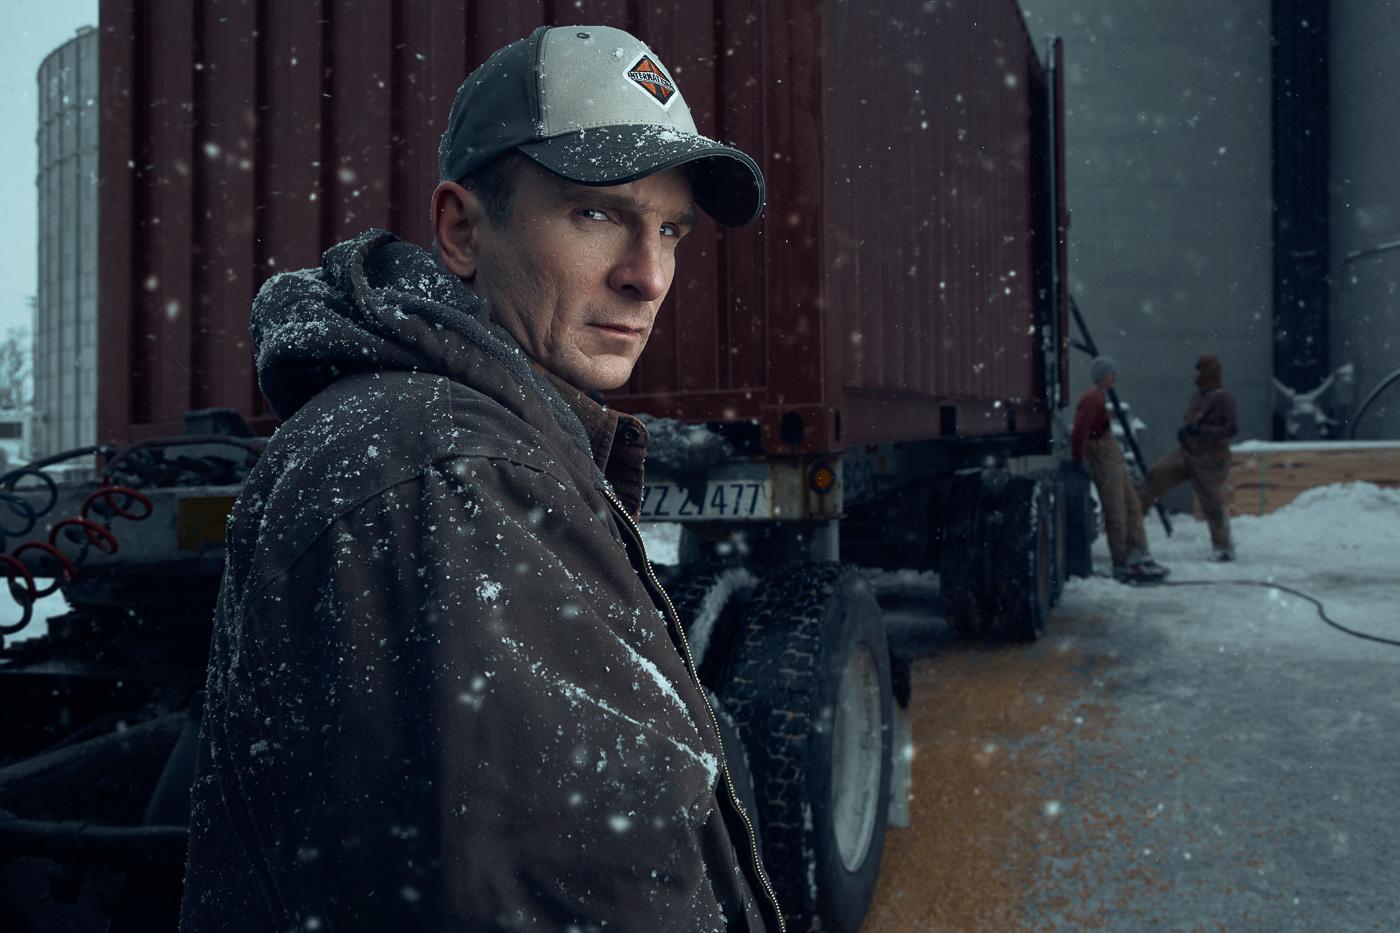 environmental portraits cinematic Trucker portraits color grade retouching  high end retouching Commercial Retouching Creative Retouching